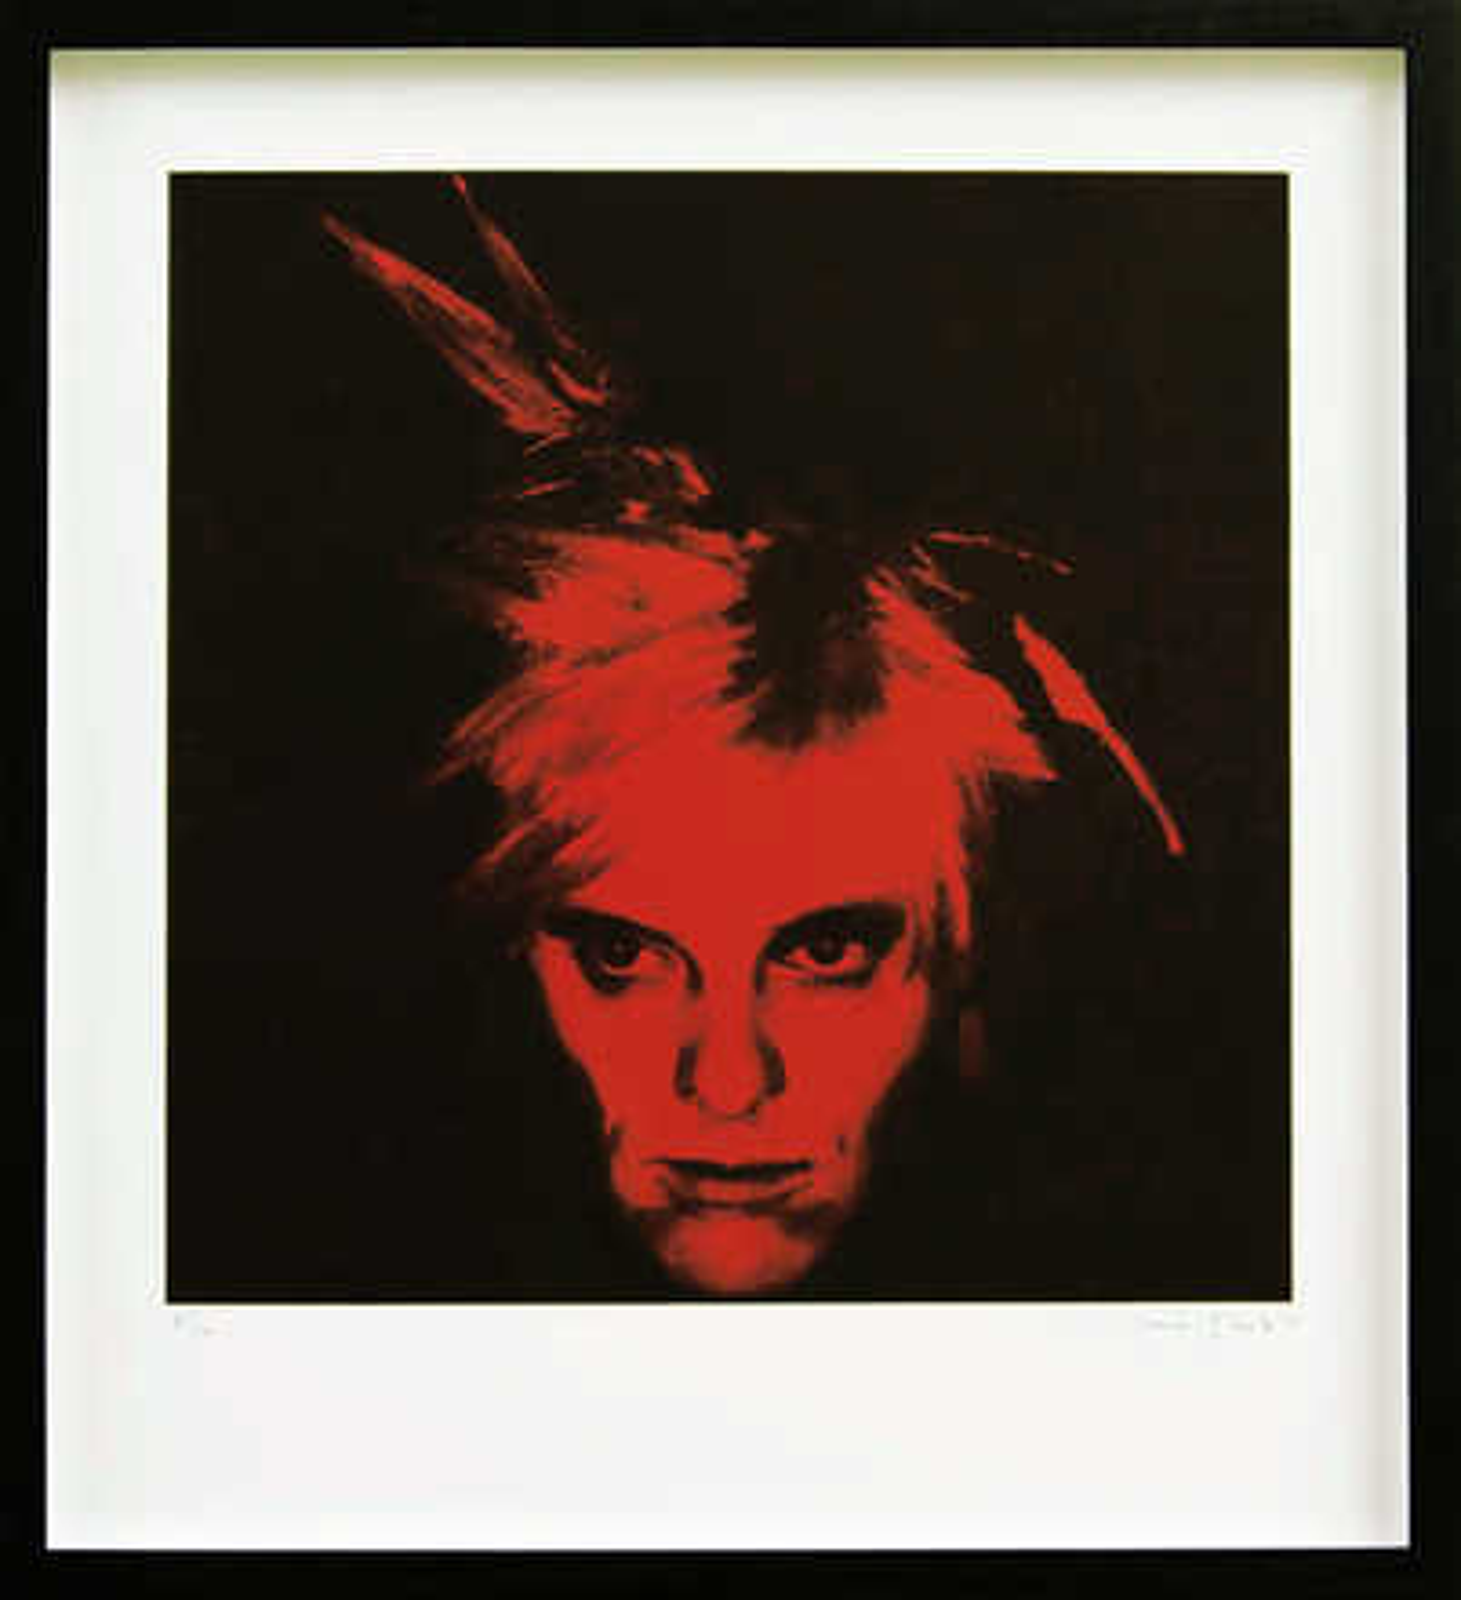 Fright Wig (Red) - Gavin Turk